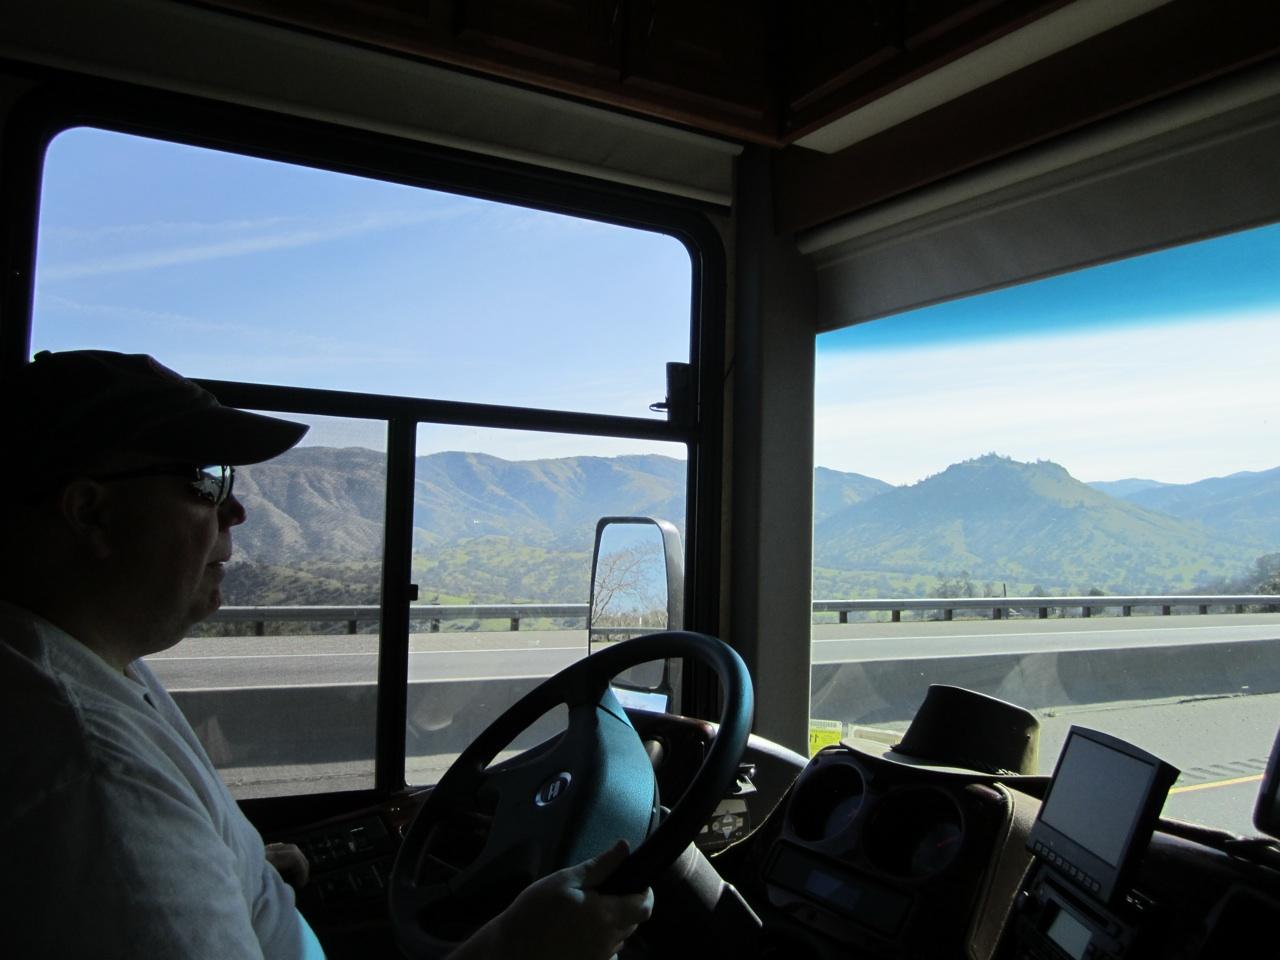 David Driving Through Beautiful Mountain Areas